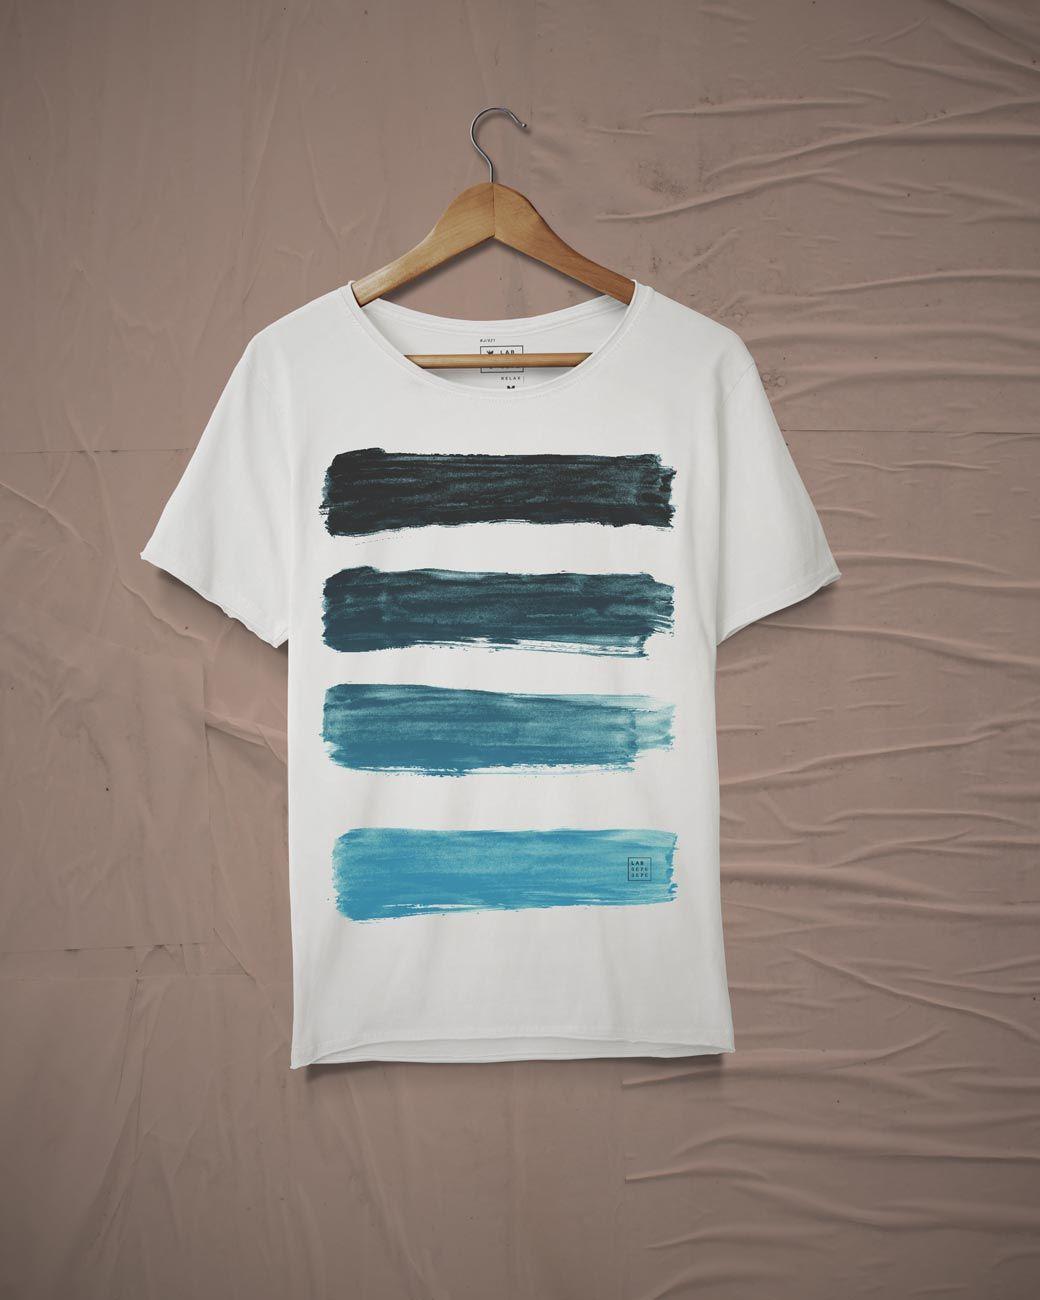 Camiseta Ink Masculino, Novidades, Praia, Rua - Lab77